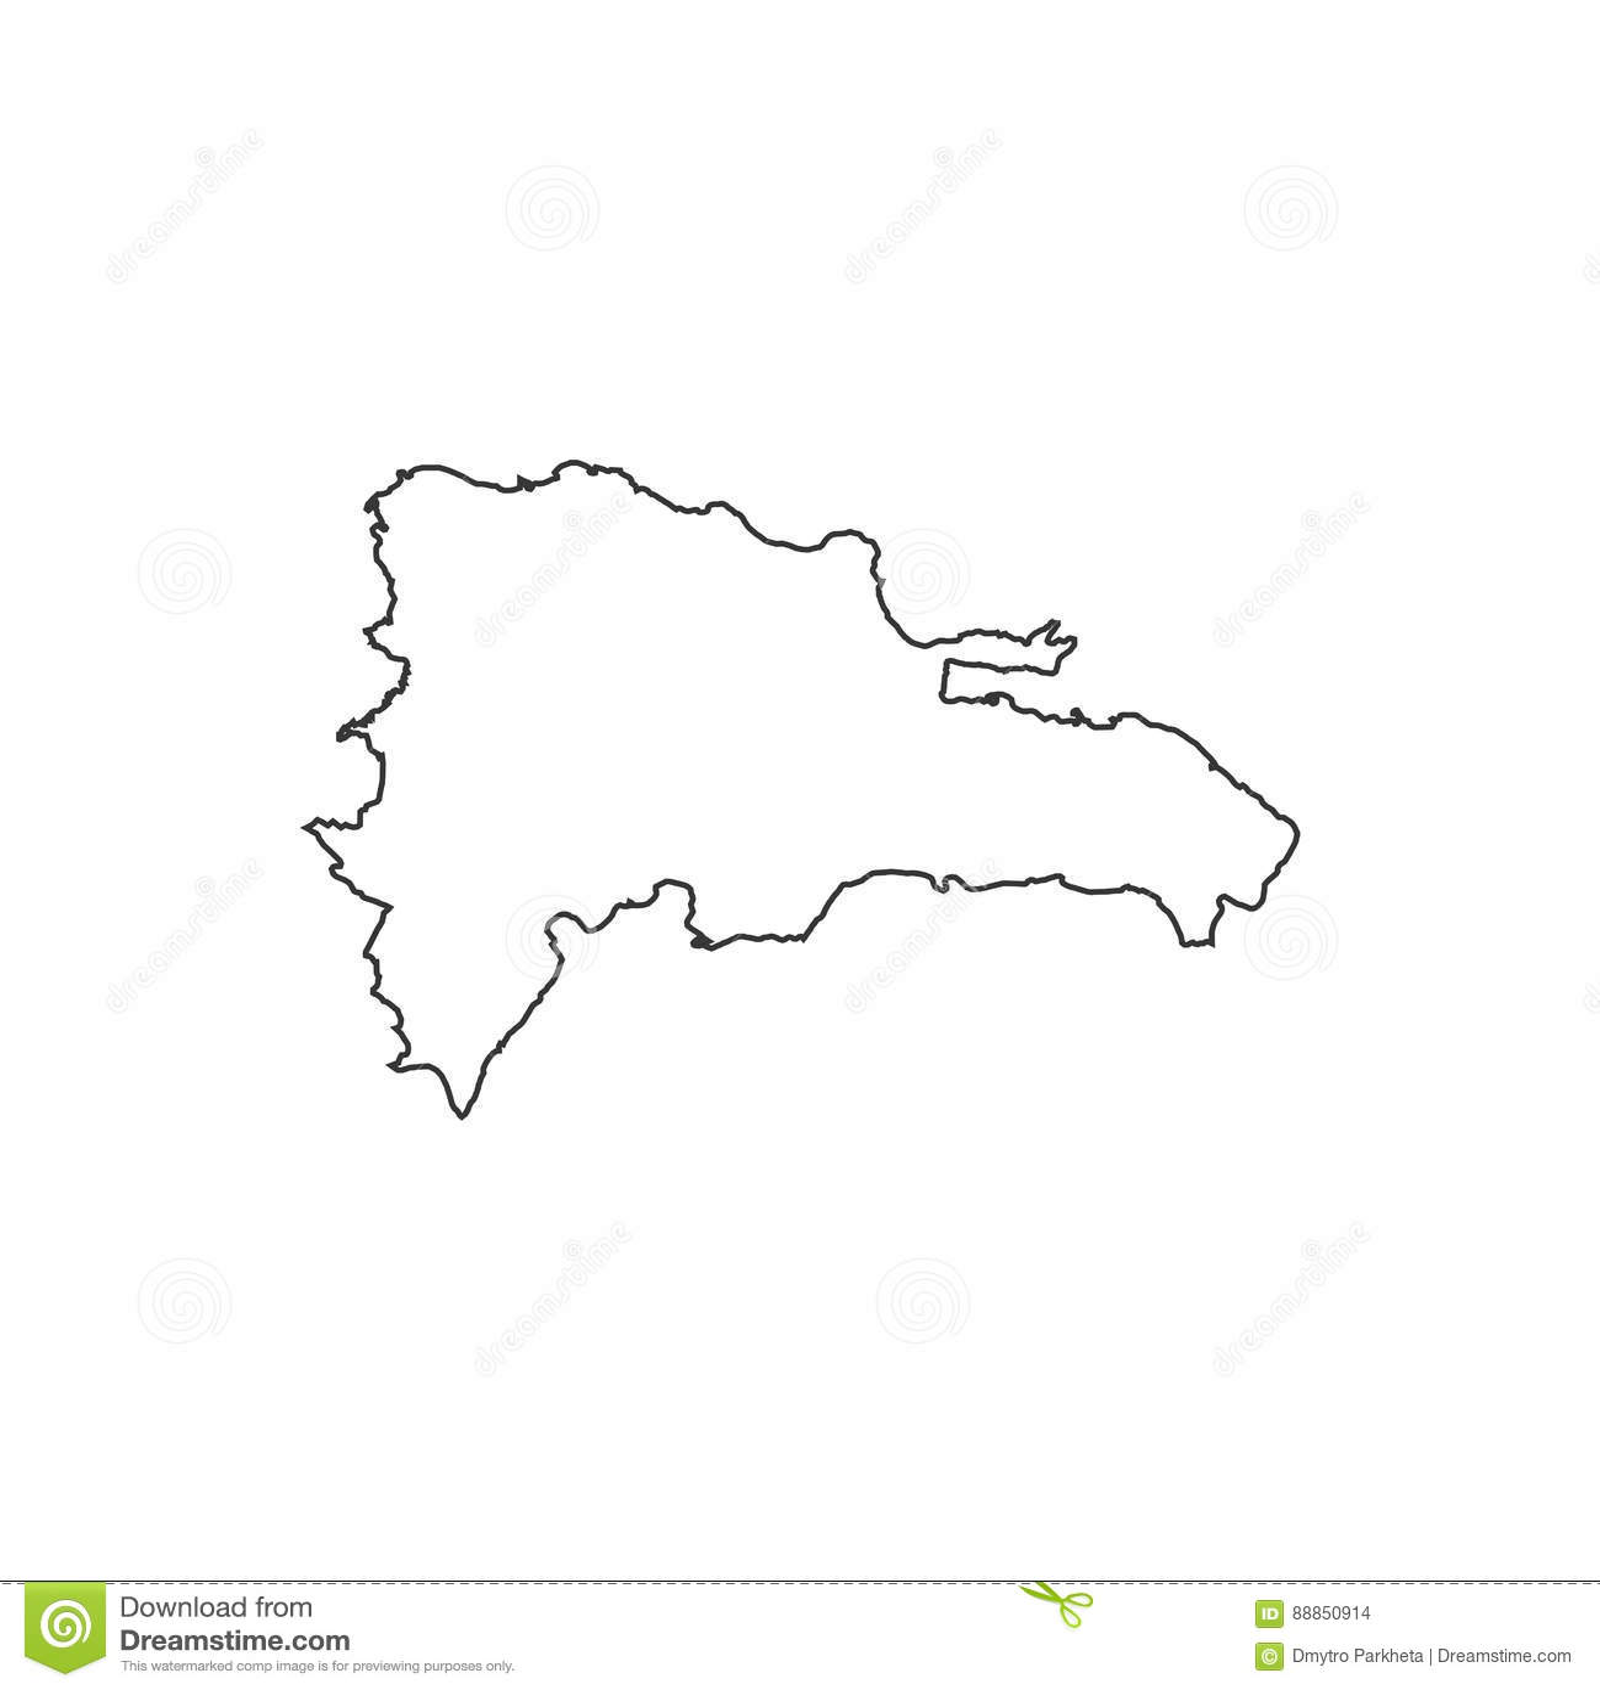 Mapa De Republica Dominicana En Blanco.Silueta Del Mapa De La Republica Dominicana Ilustracion Del